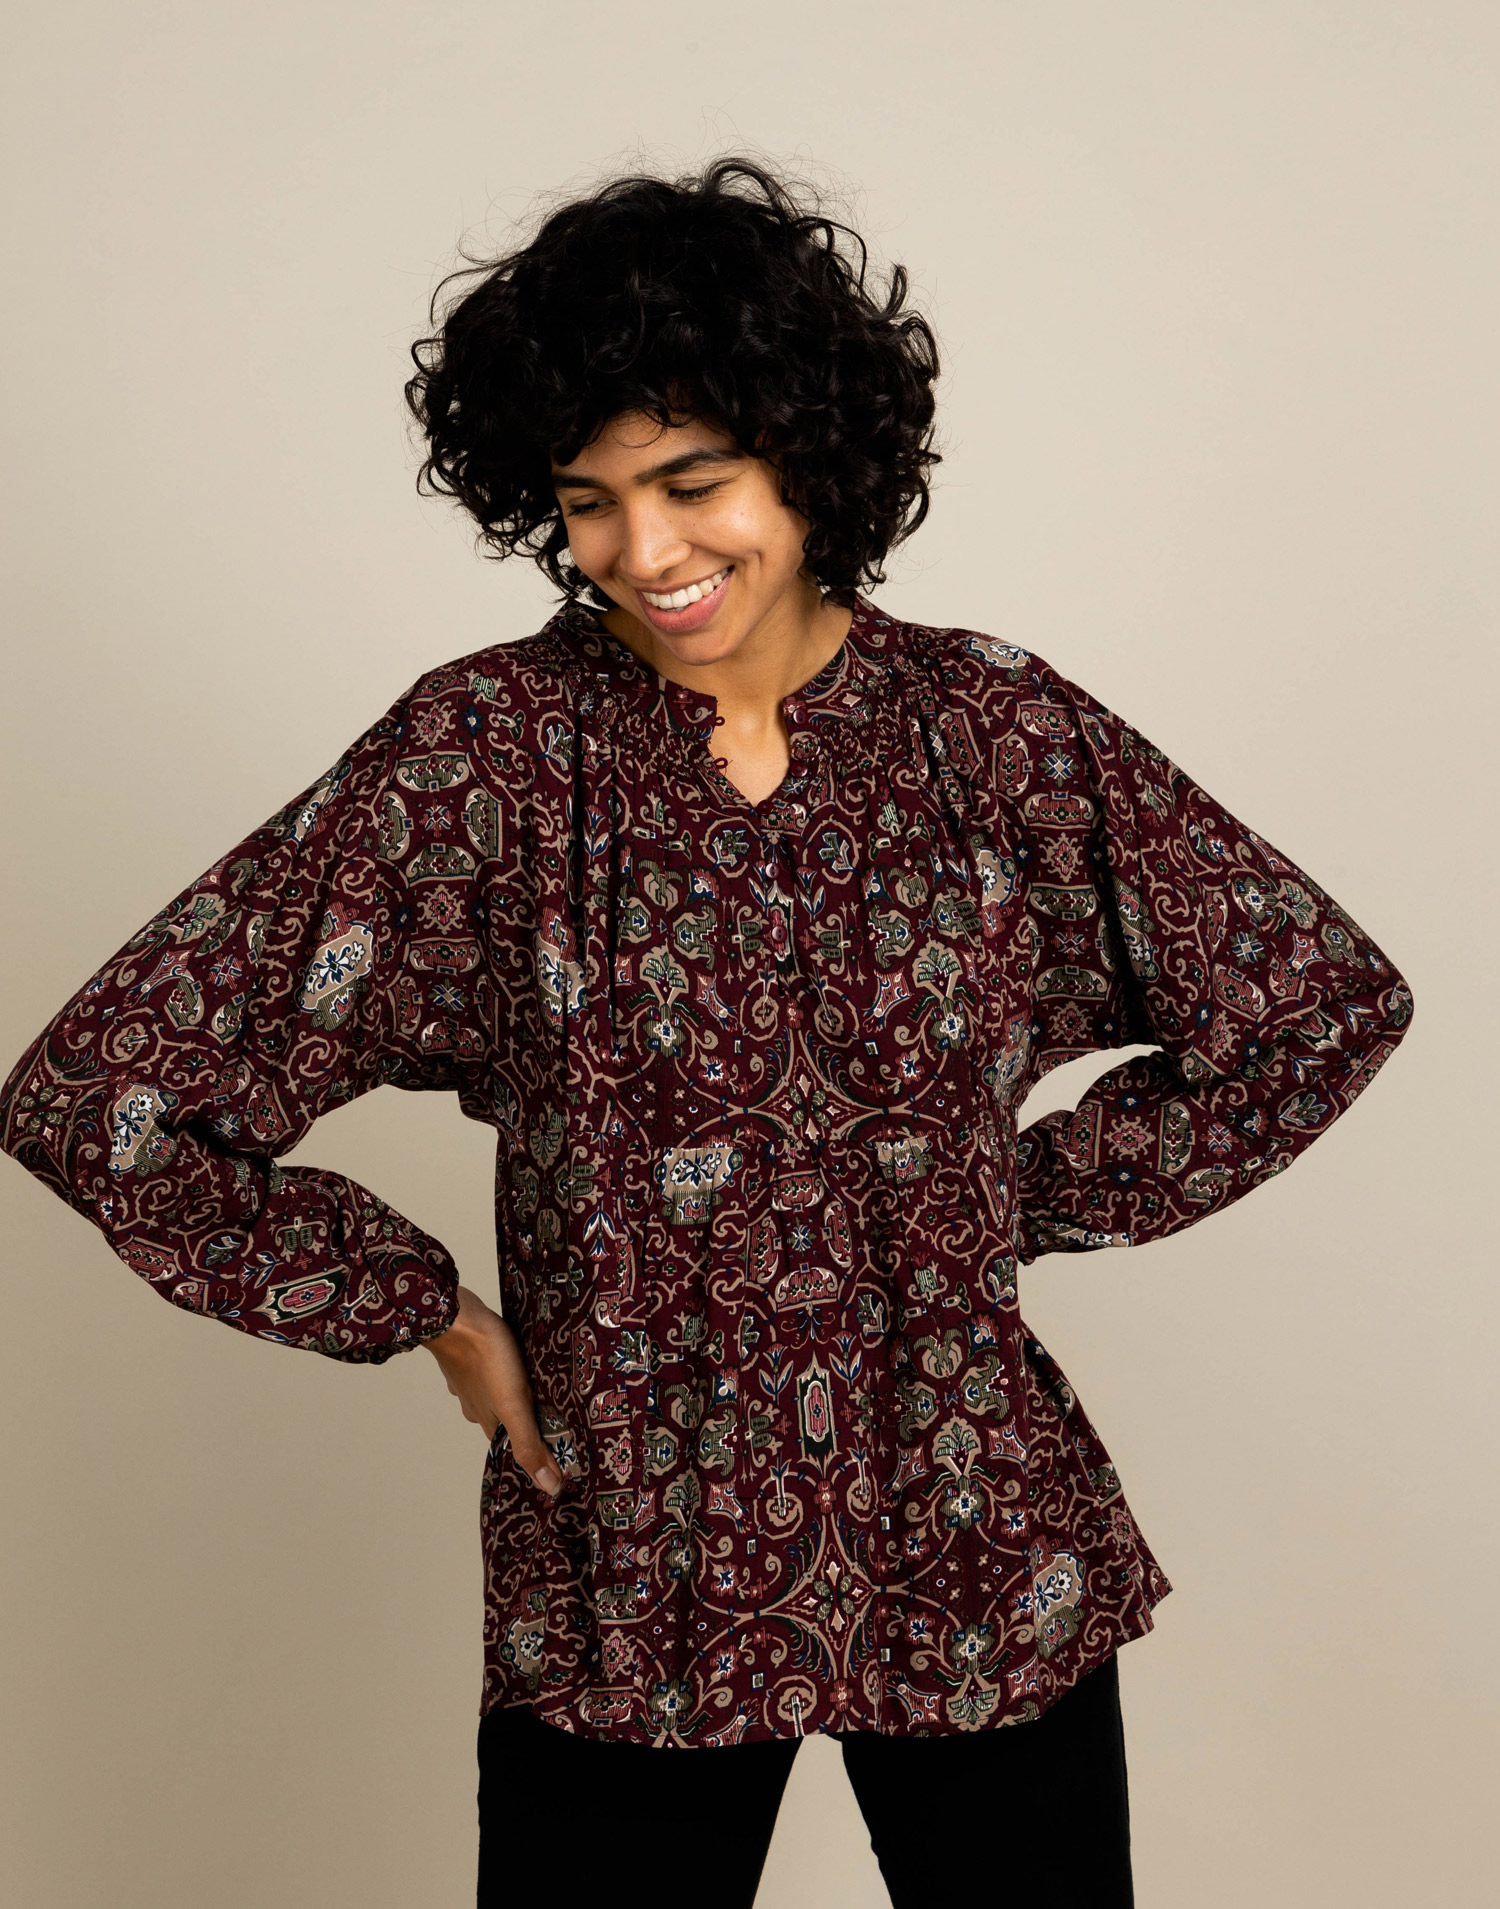 Mosaic blouse